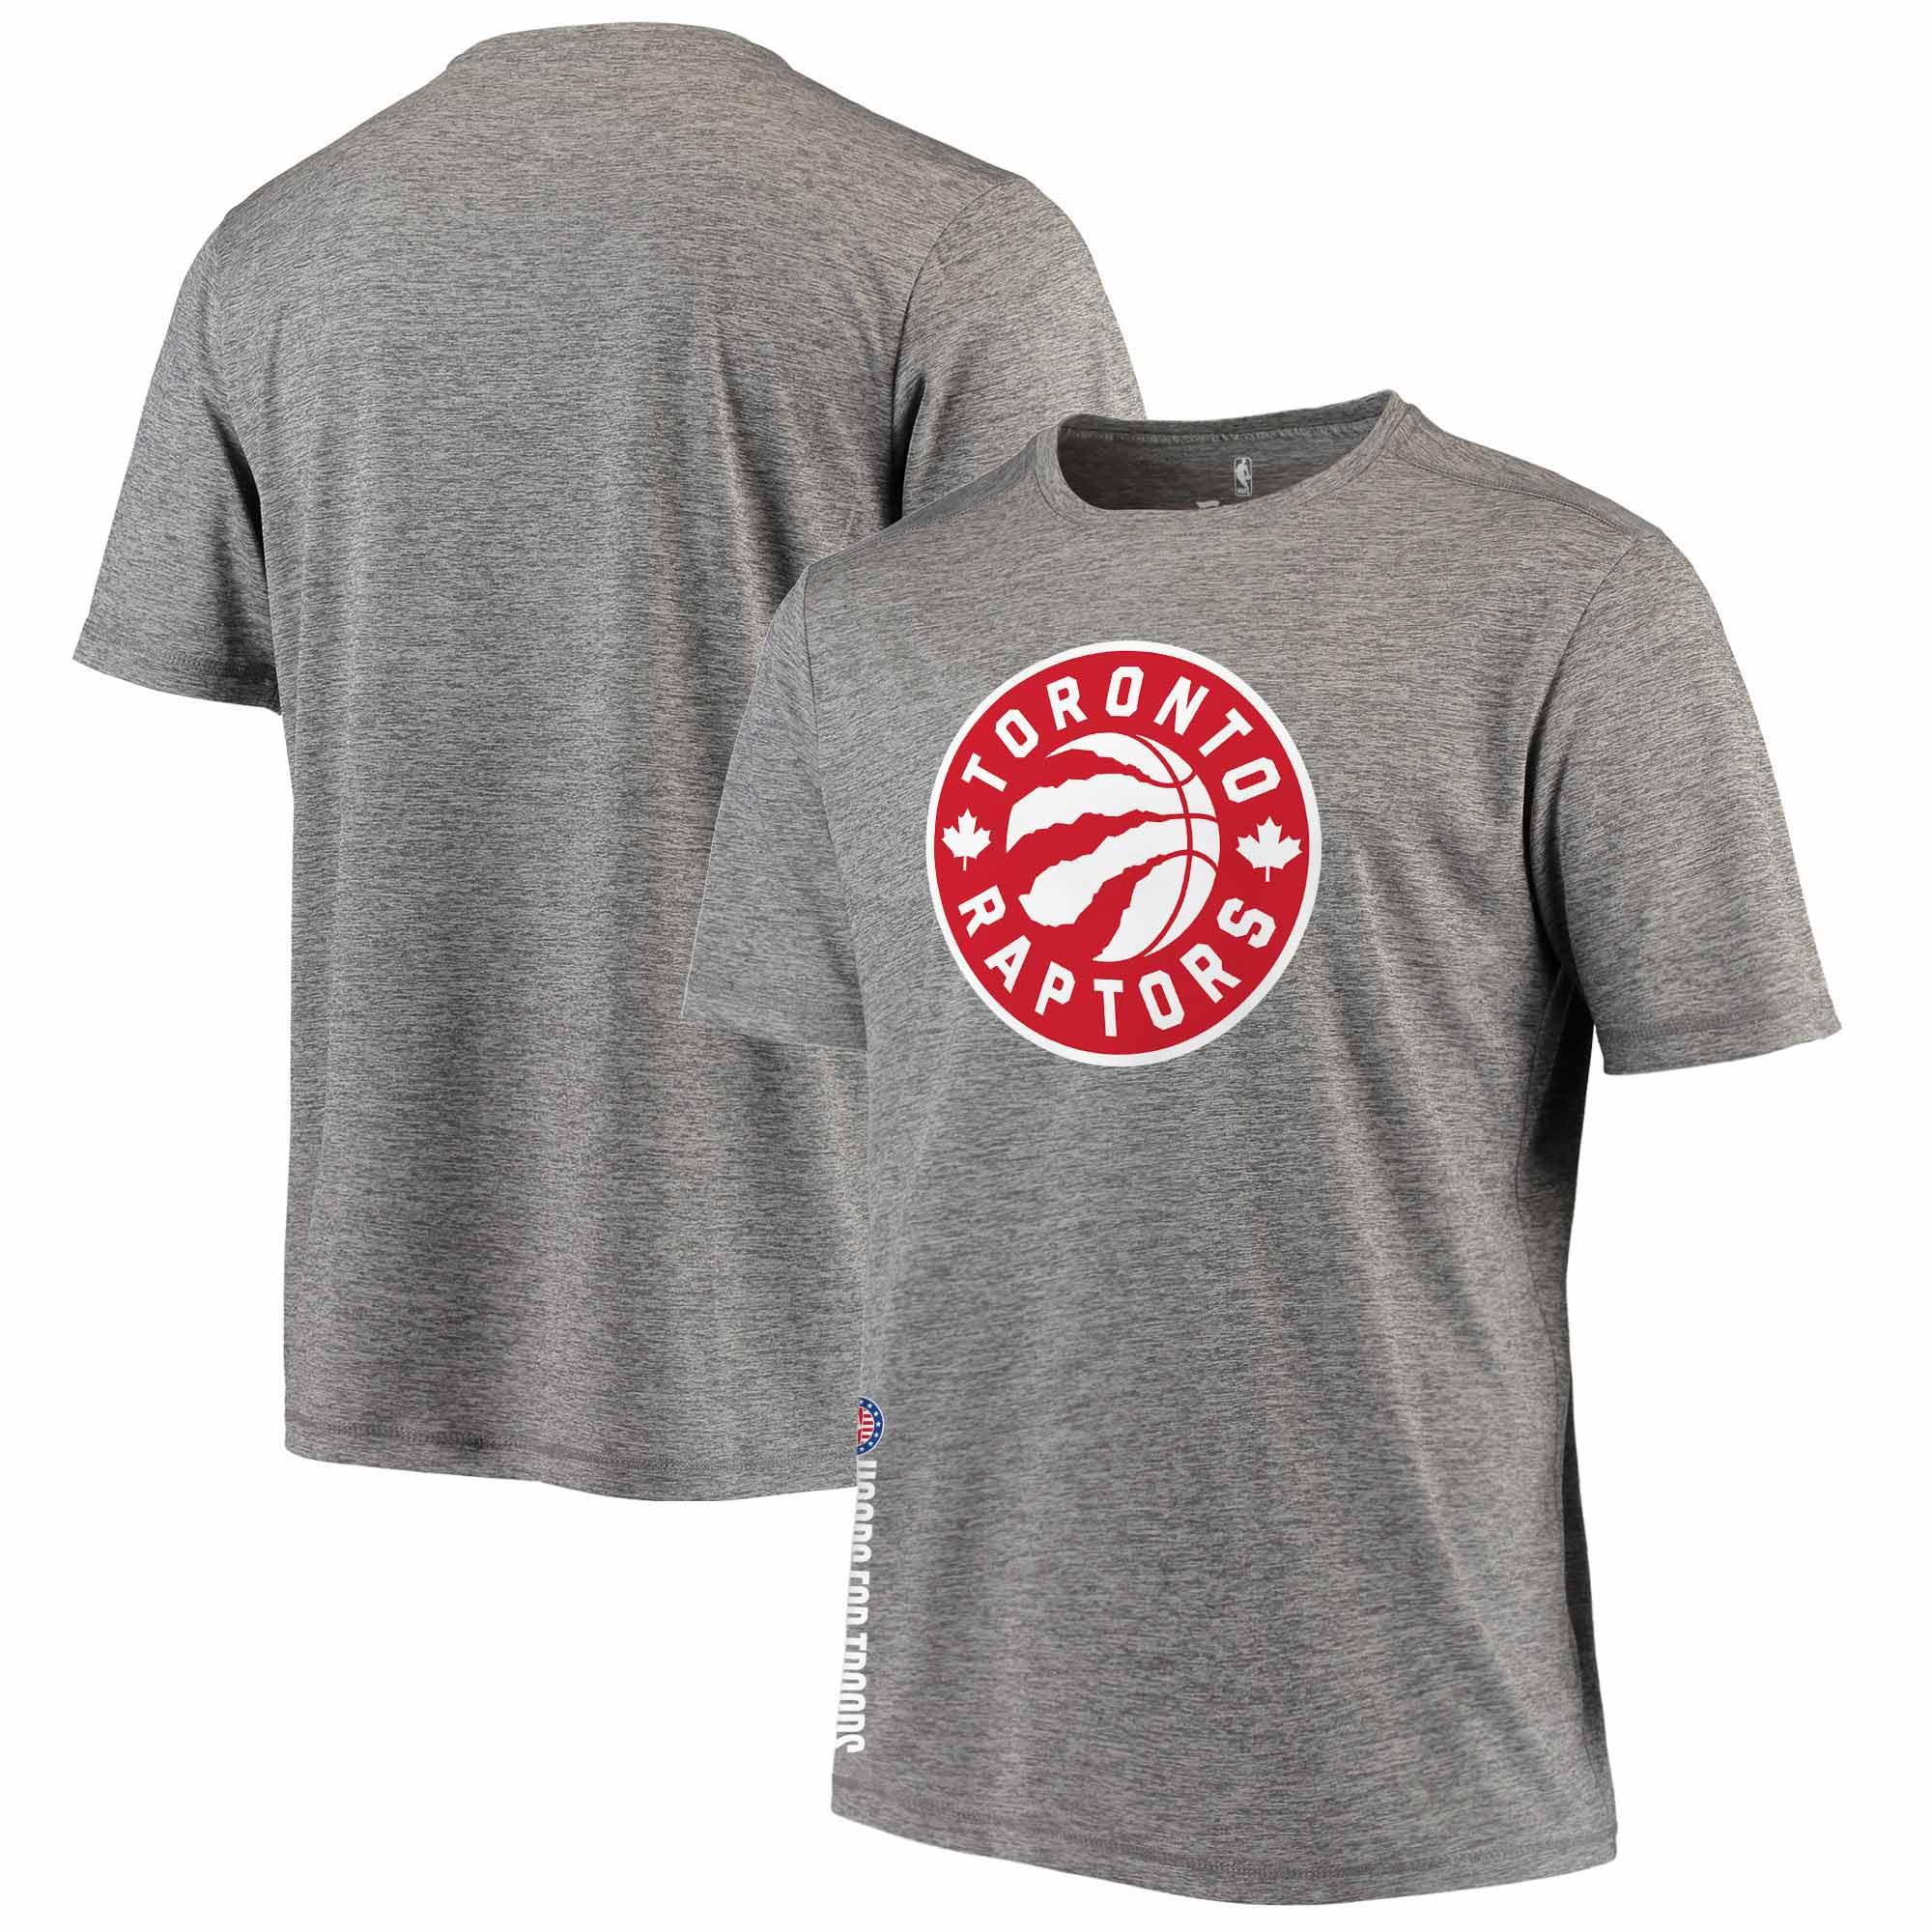 Toronto Raptors Fanatics Branded Hoops For Troops T-Shirt - Heathered Gray